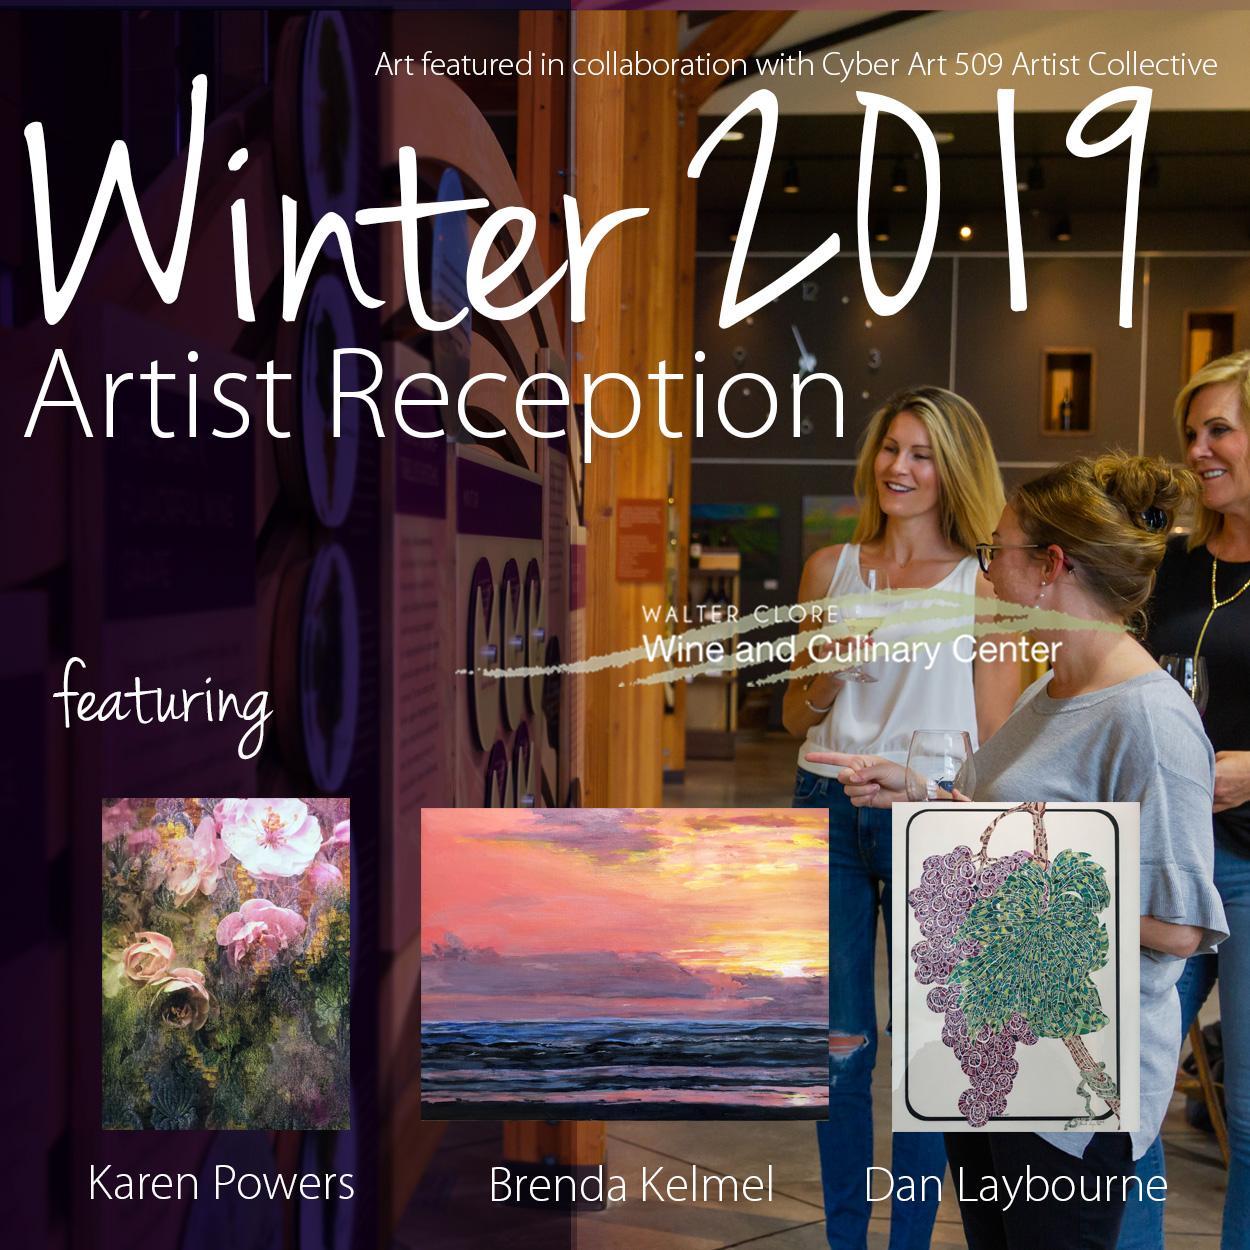 Winter19ArtistReceptionSquare - Cyber Art 509 artist reception at the Clore Center